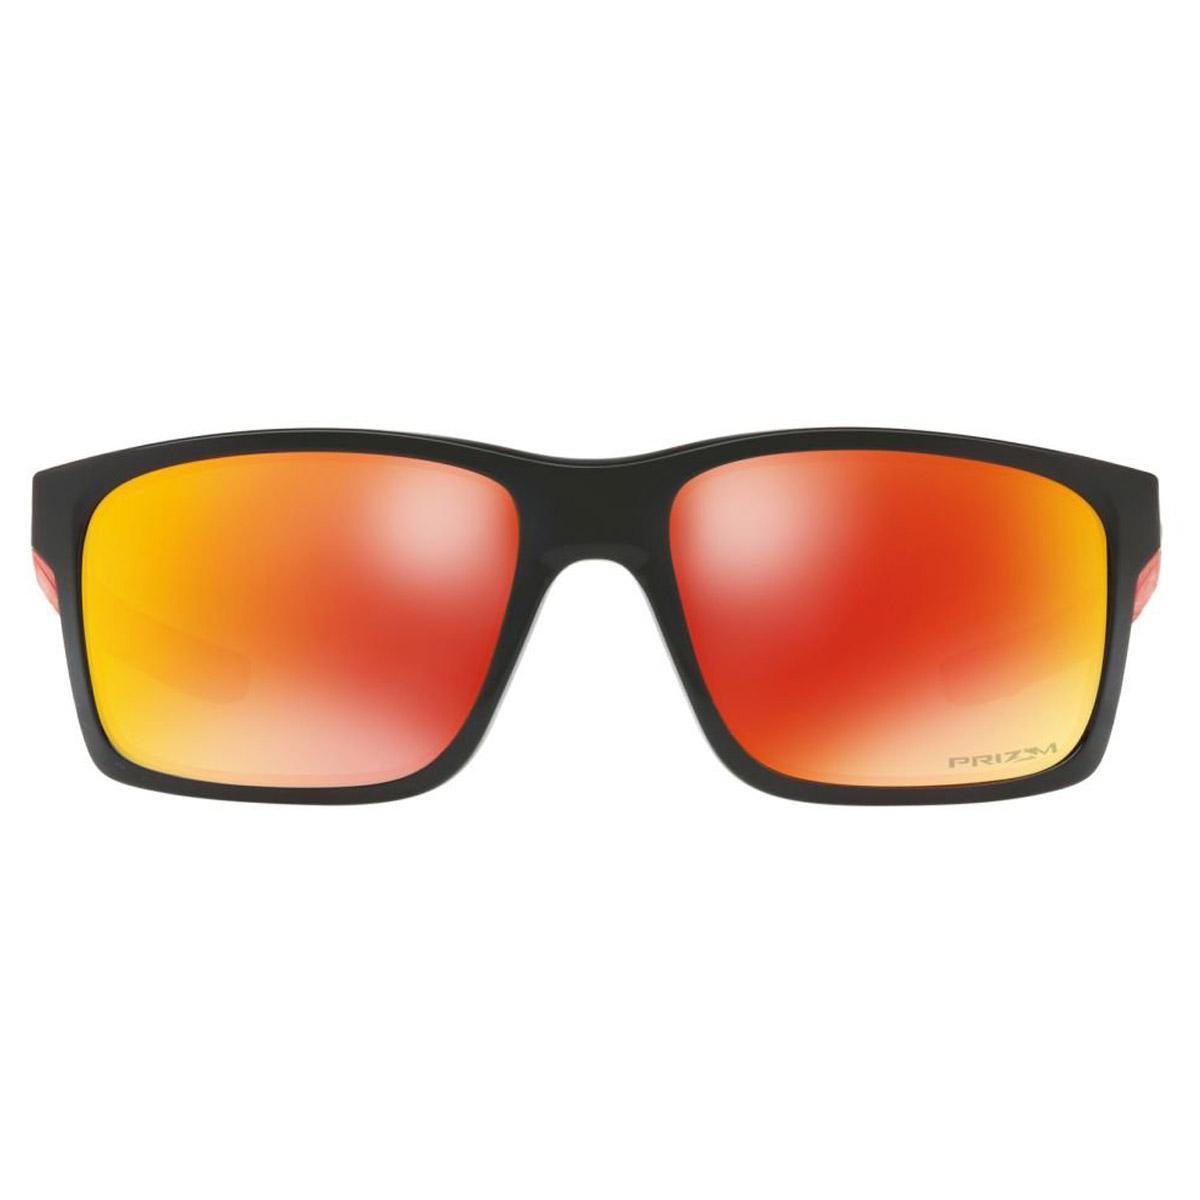 ... Óculos Oakley Mainlink Polished Prizm Ruby Polarizado Masculino ... 5399656b20